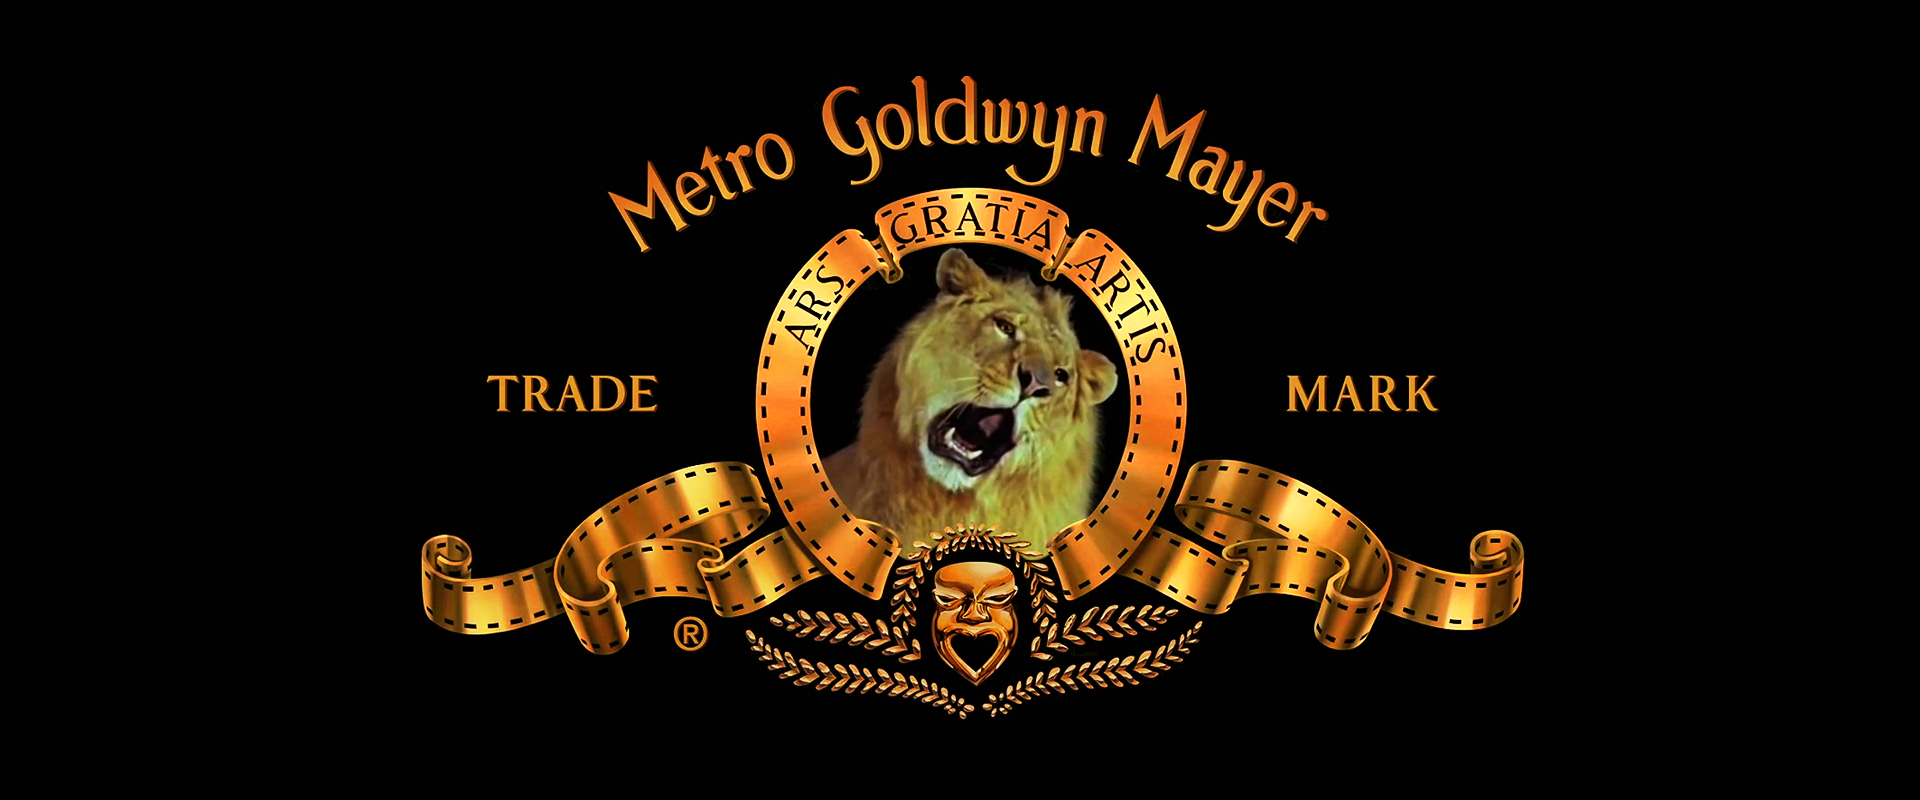 lion company logos